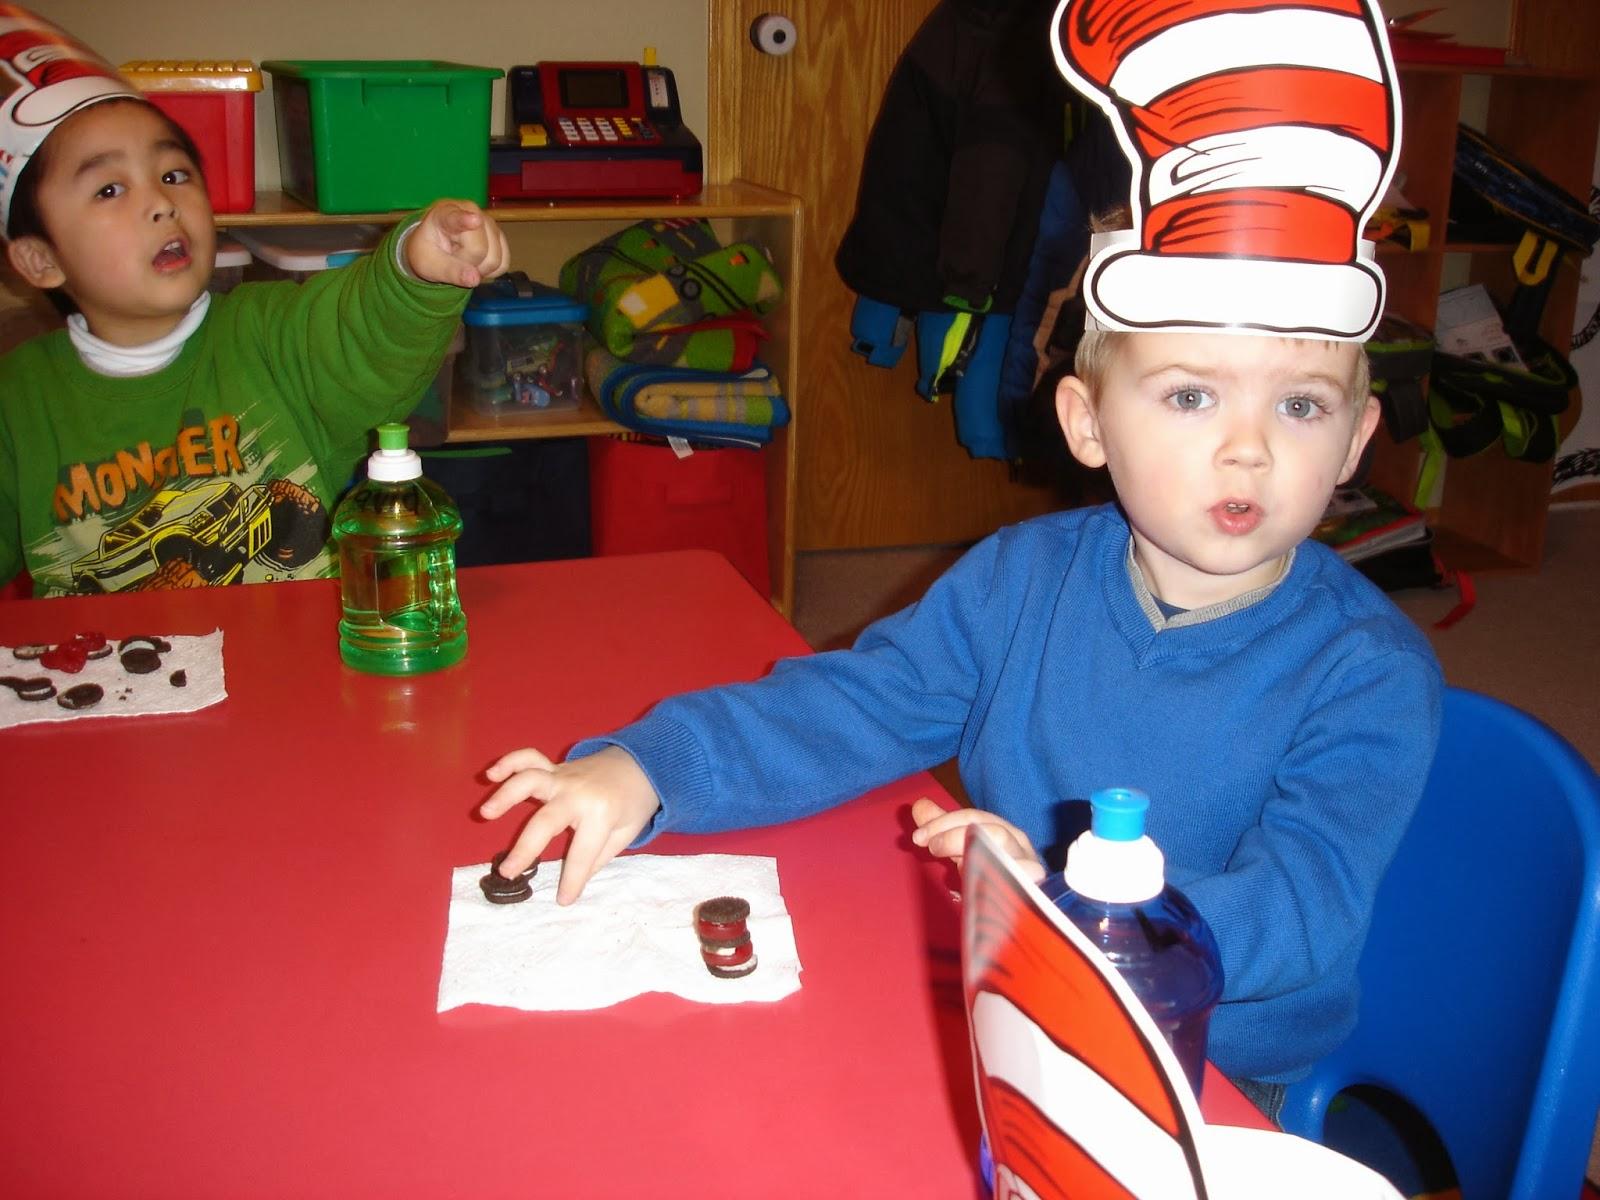 Ms Boedee S Kinder Prep Dr Seuss